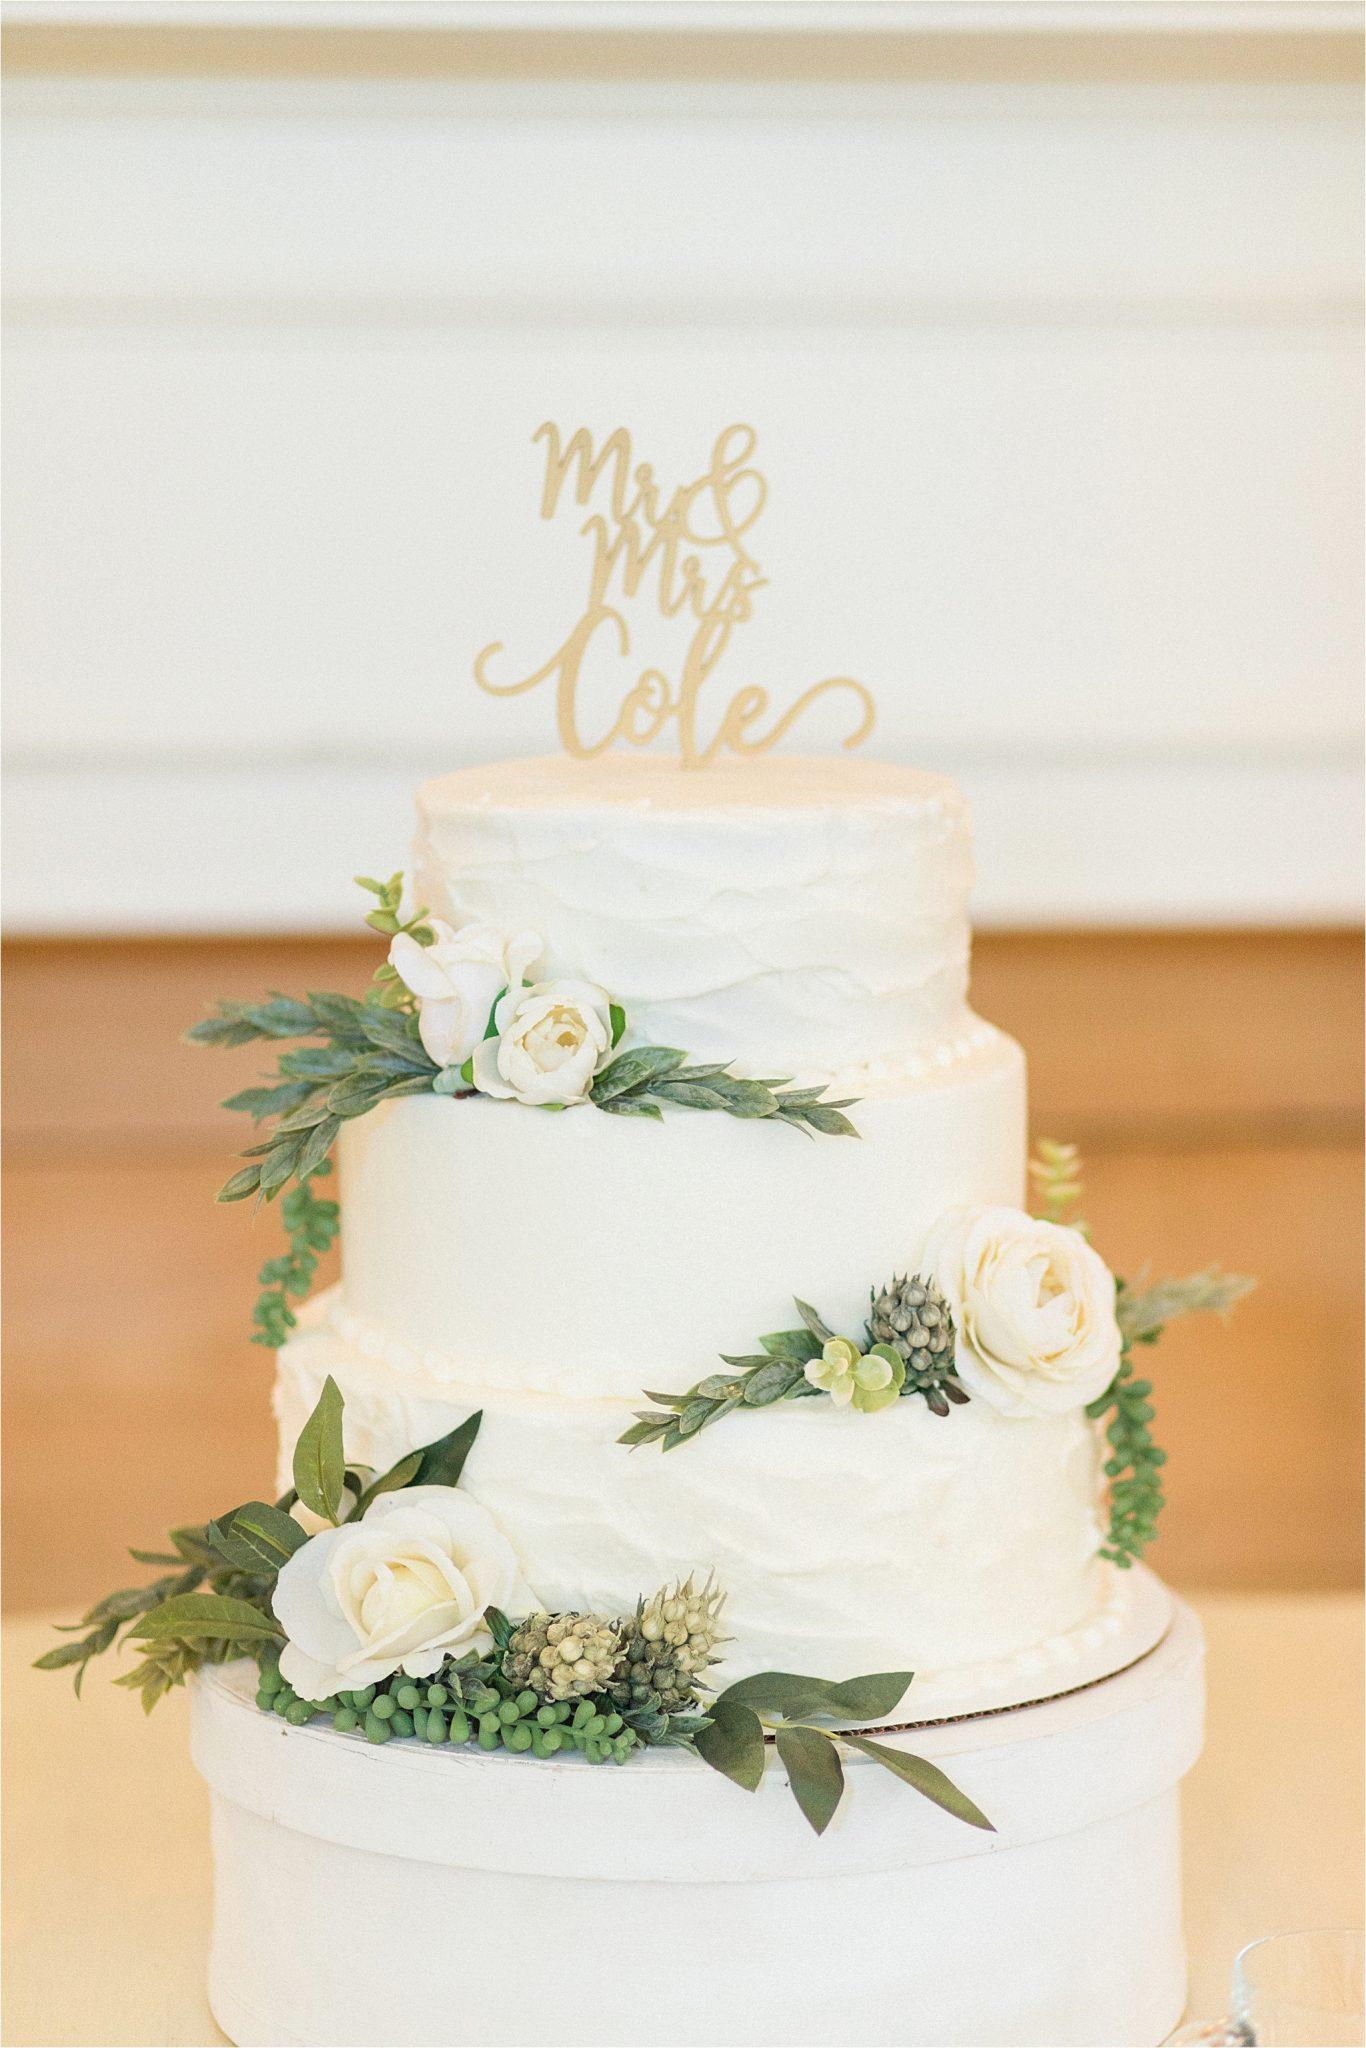 3-three-tear-iced-weding-cake-texture-white-ivory-roses-mr & mrs-cake-topper